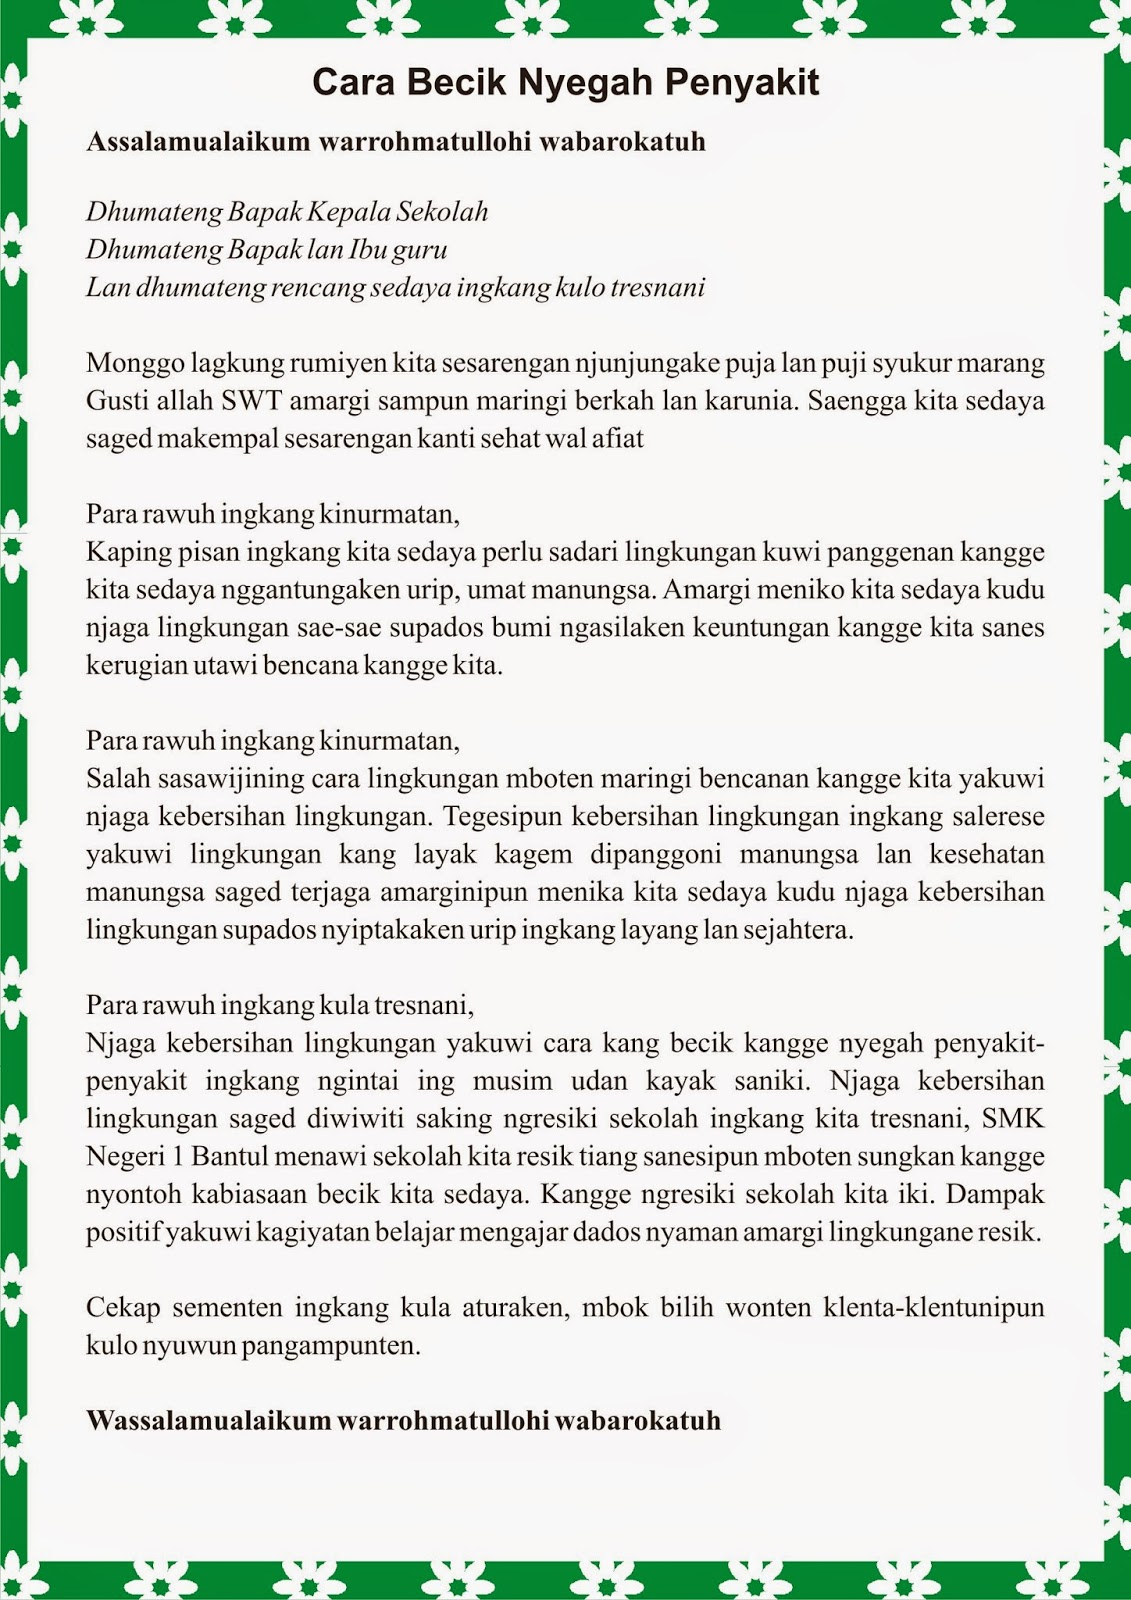 Contoh Artikel Kesehatan Menggunakan Bahasa Jawa Mathieu Comp Sci